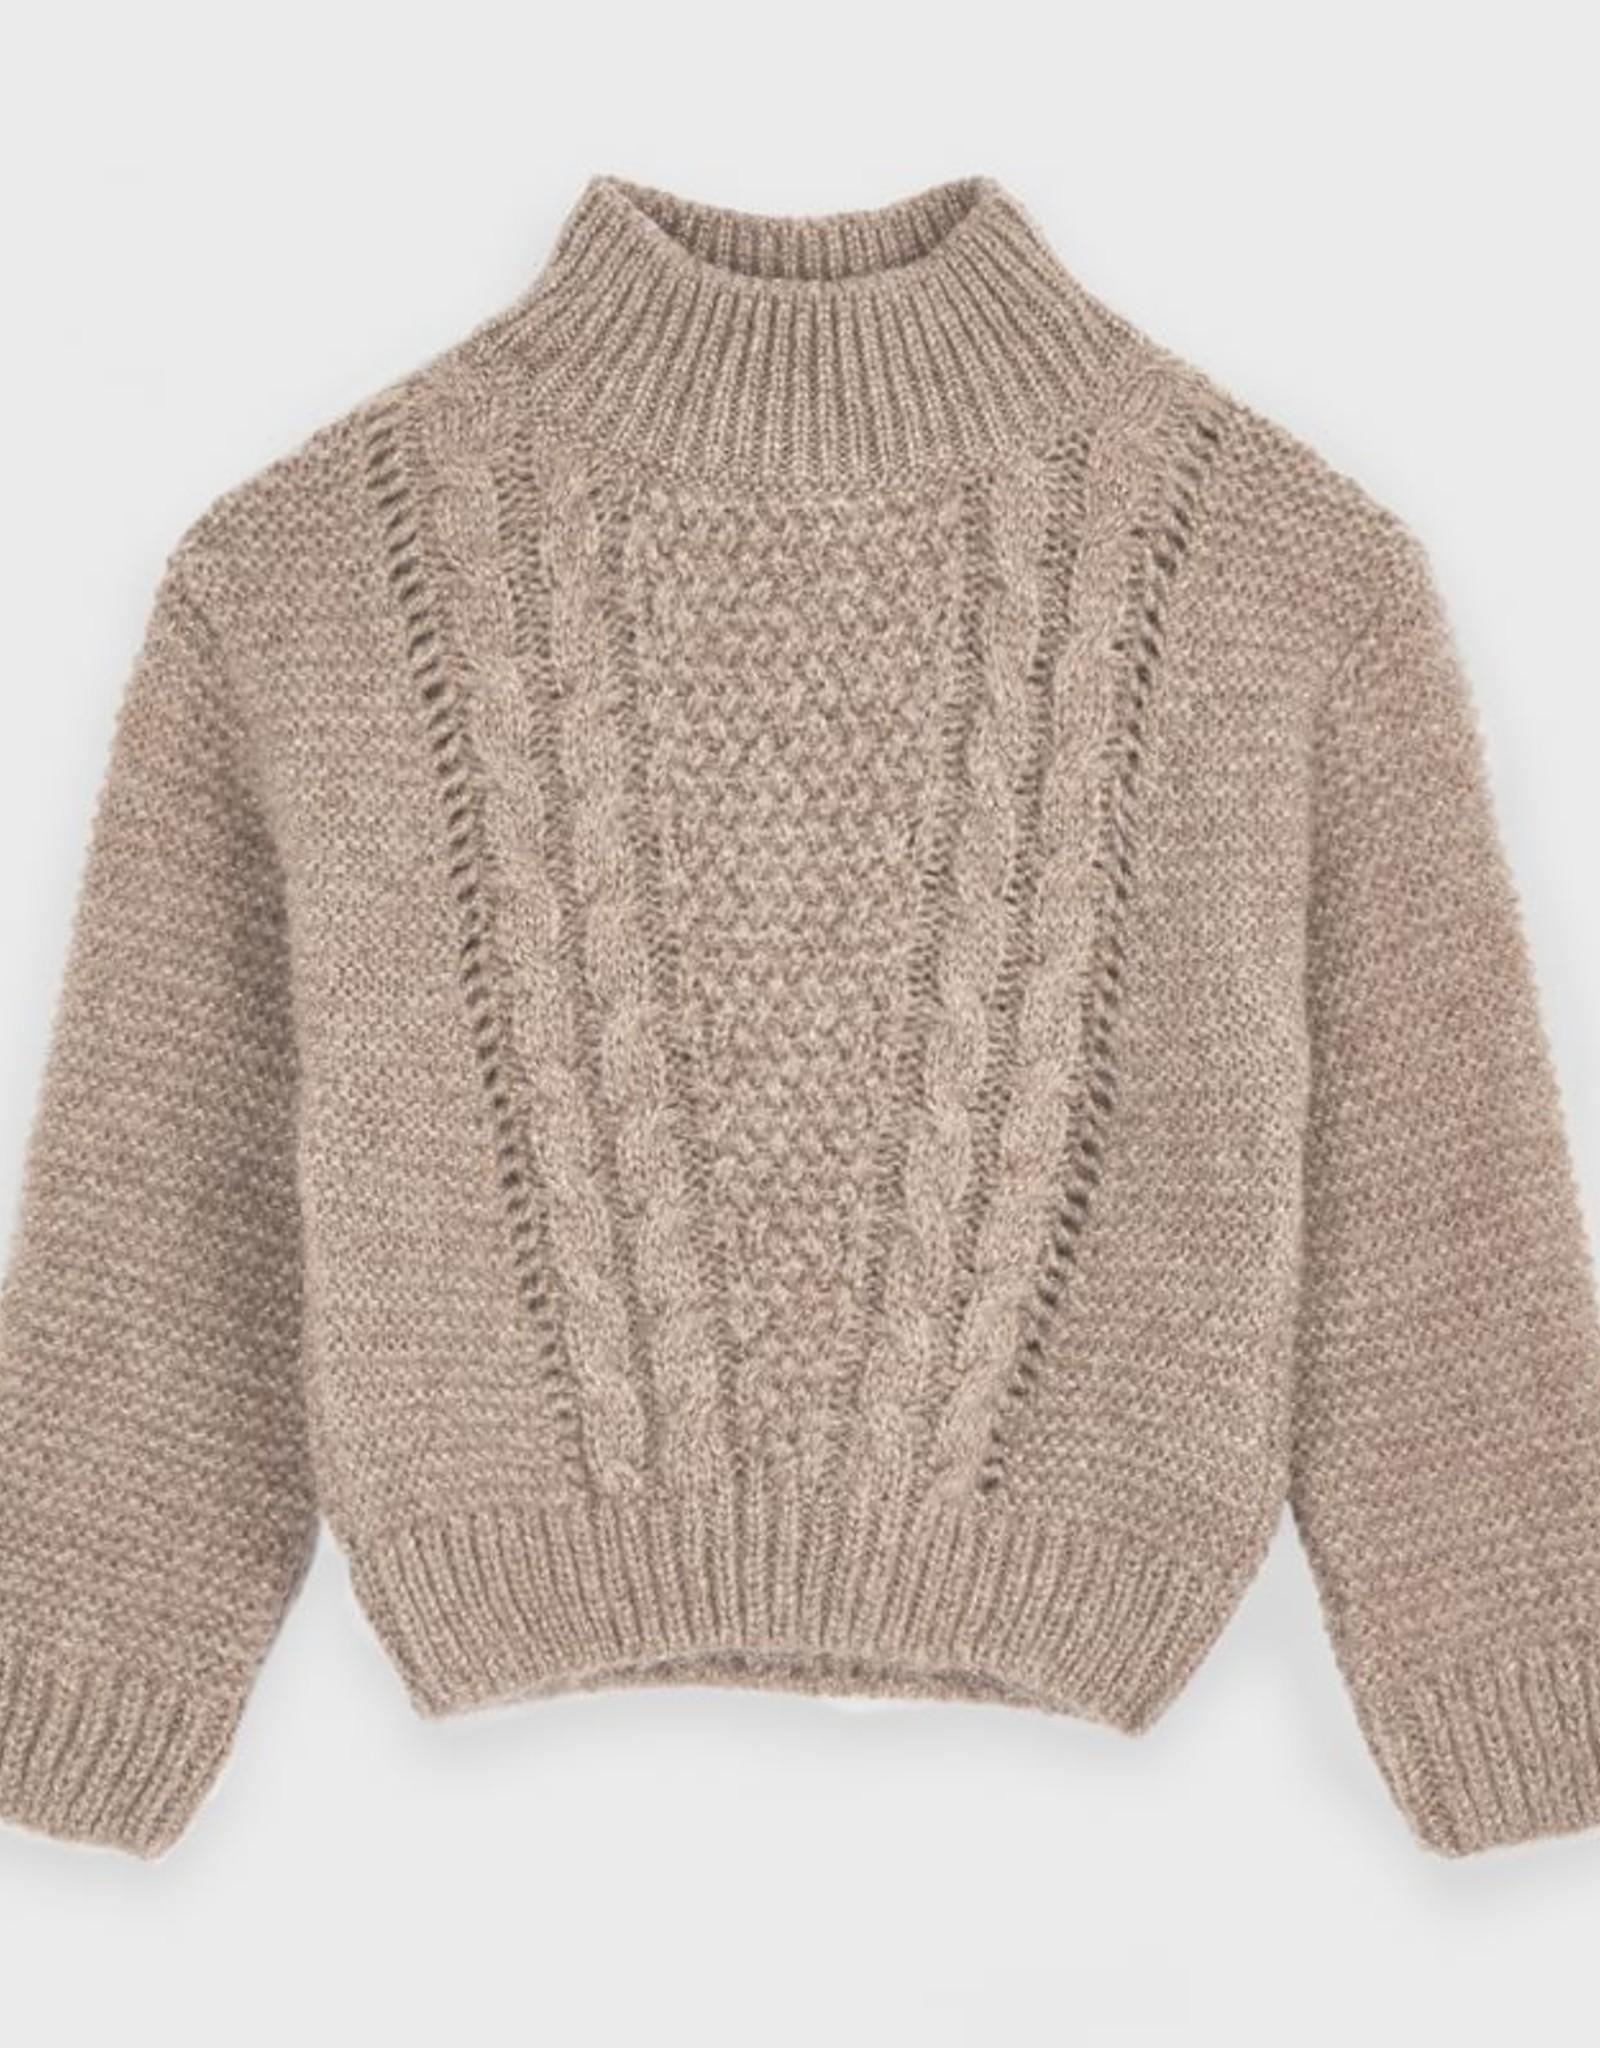 Mayoral FA20 Shiny Gold Sweater